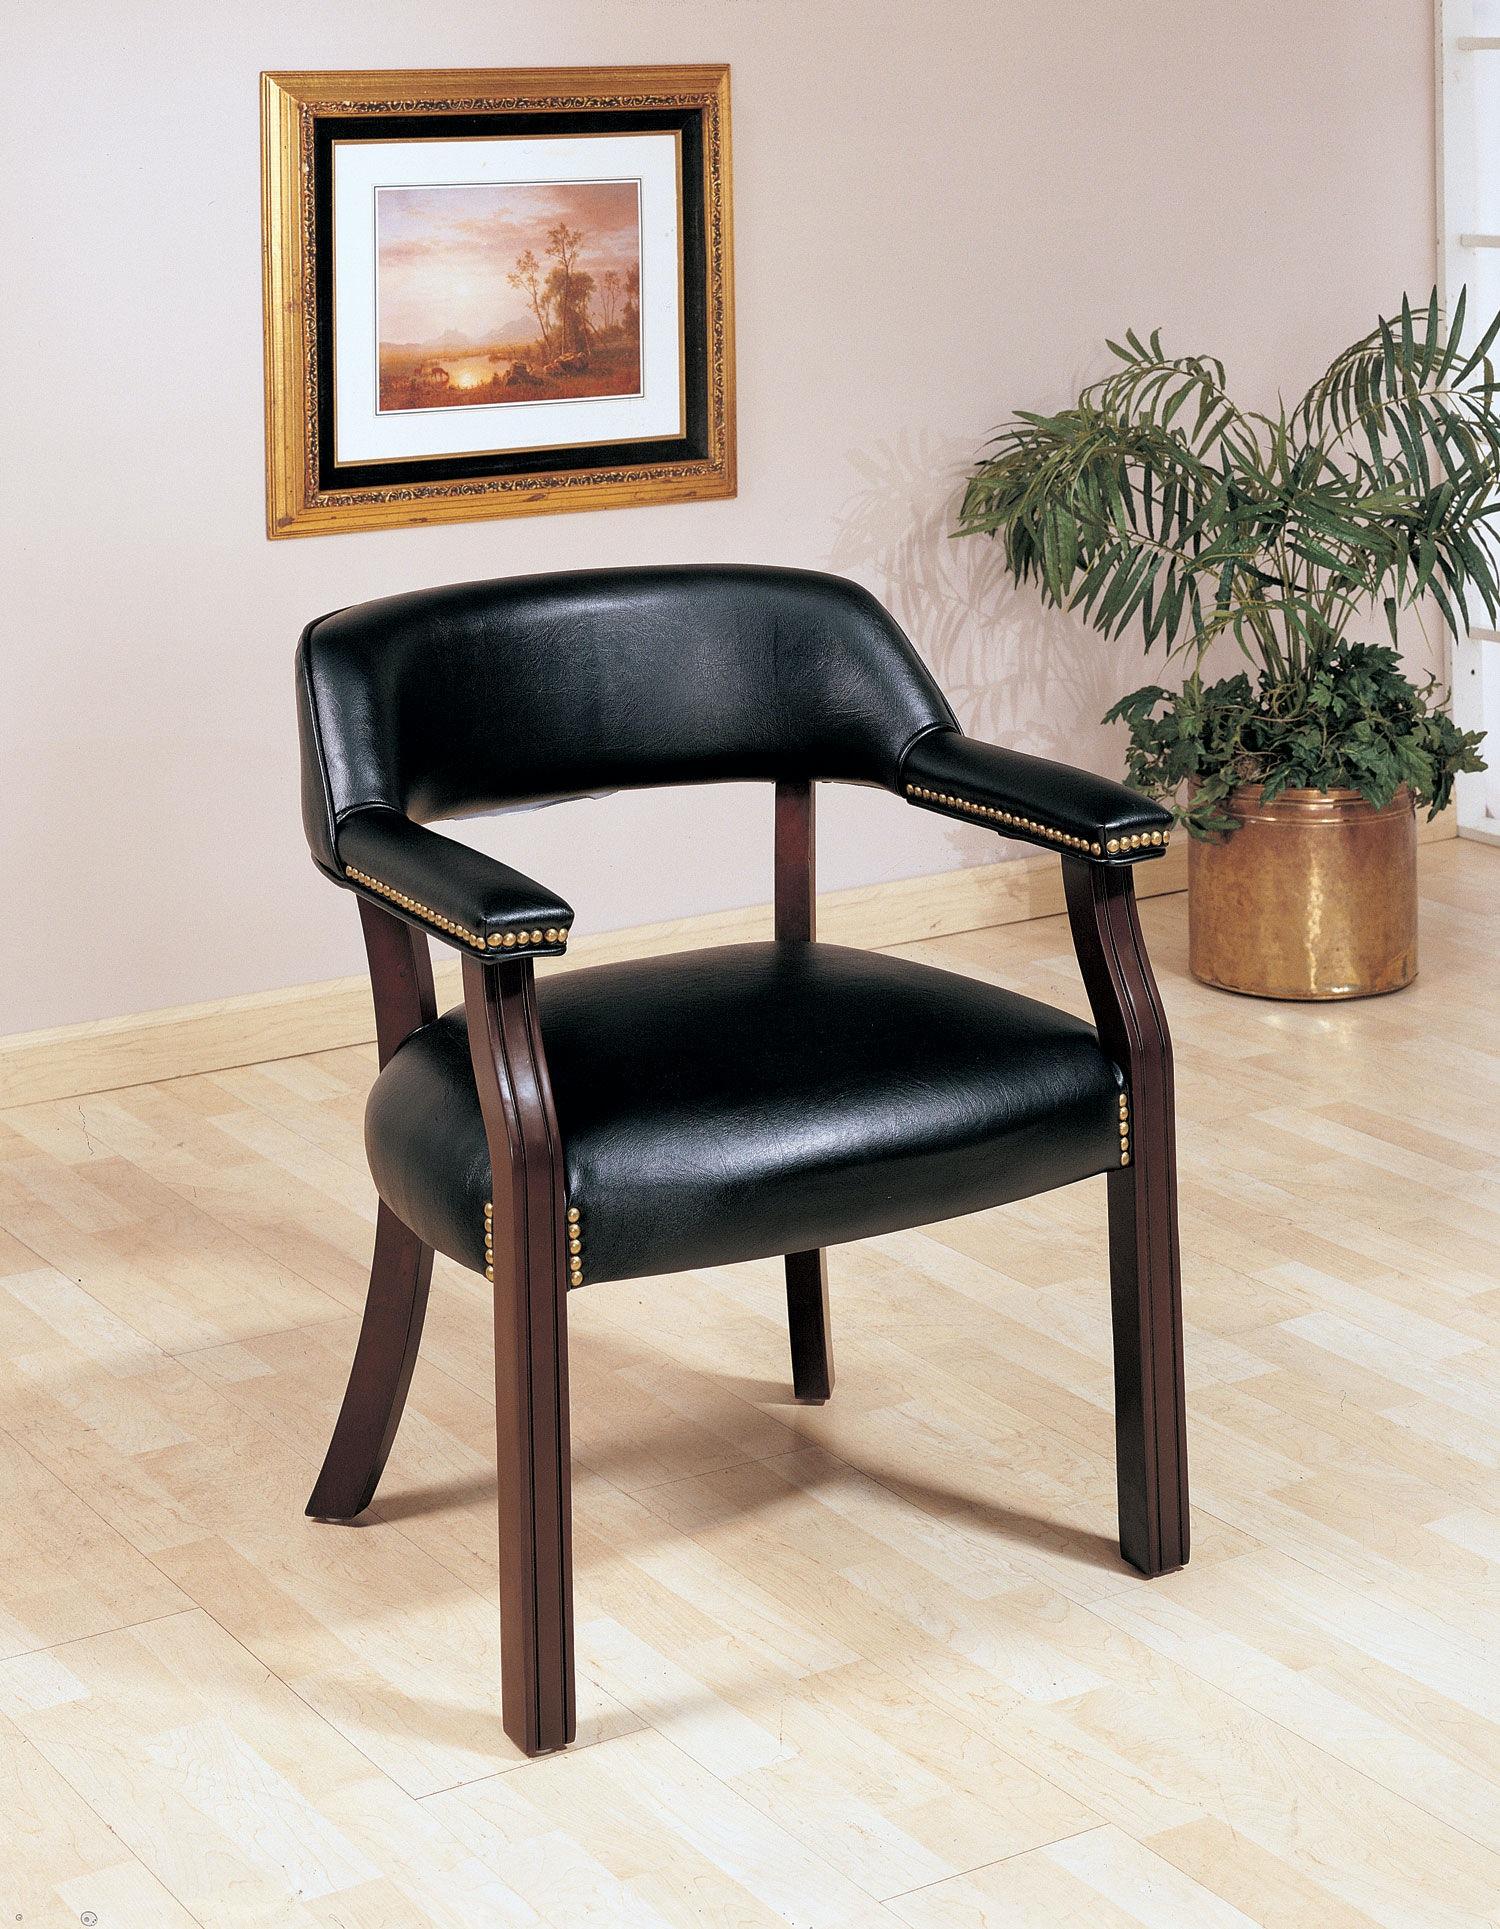 Coaster Home fice fice Chair 511K Turner Furniture